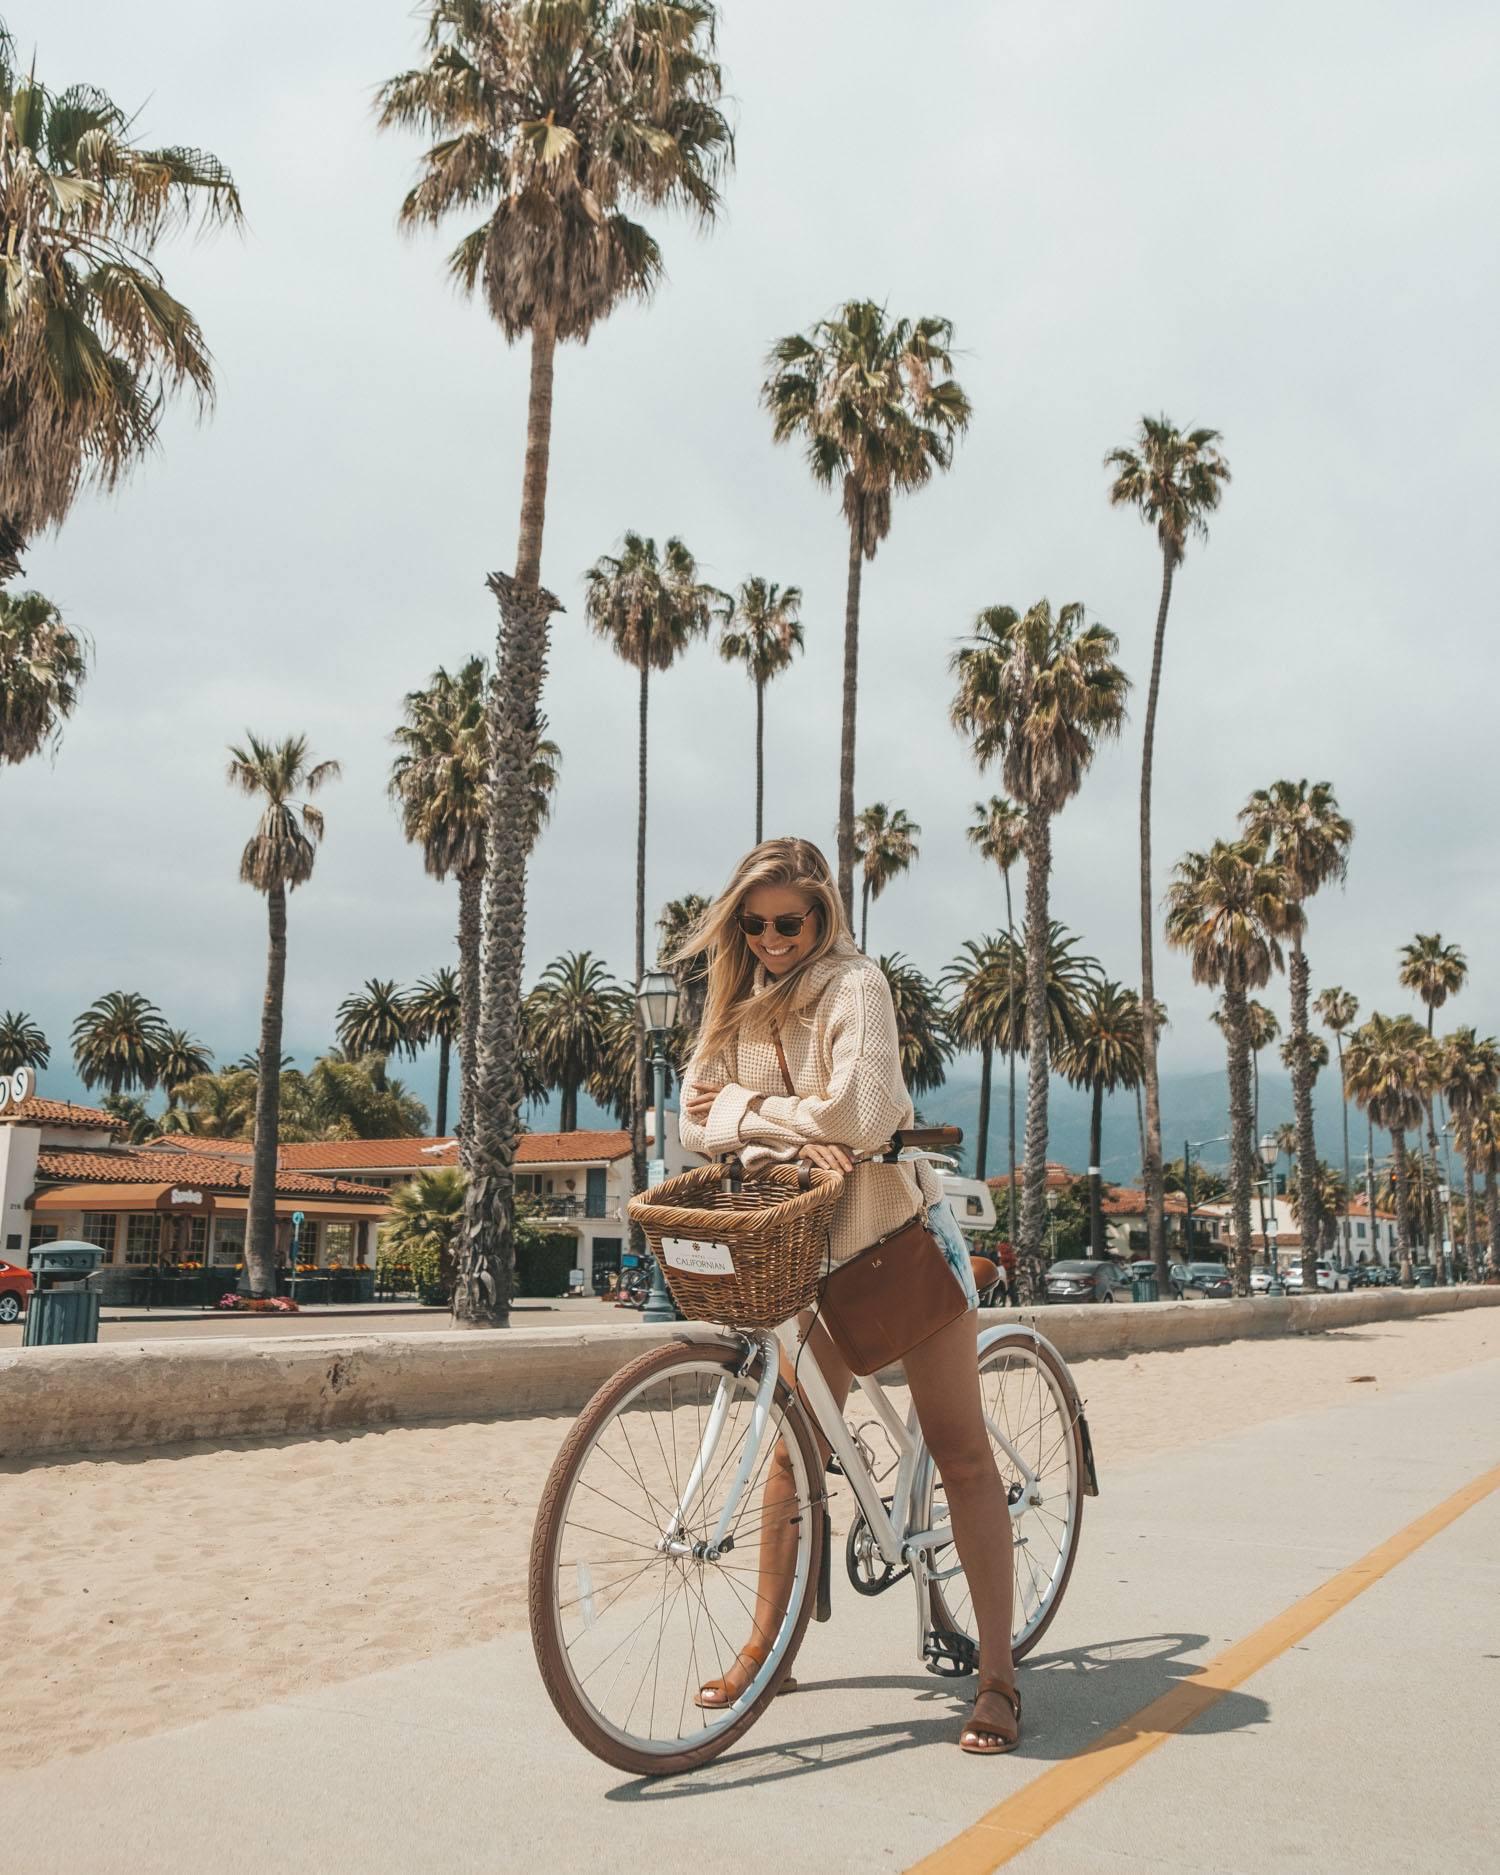 Santa Barbara Beach Boardwalk